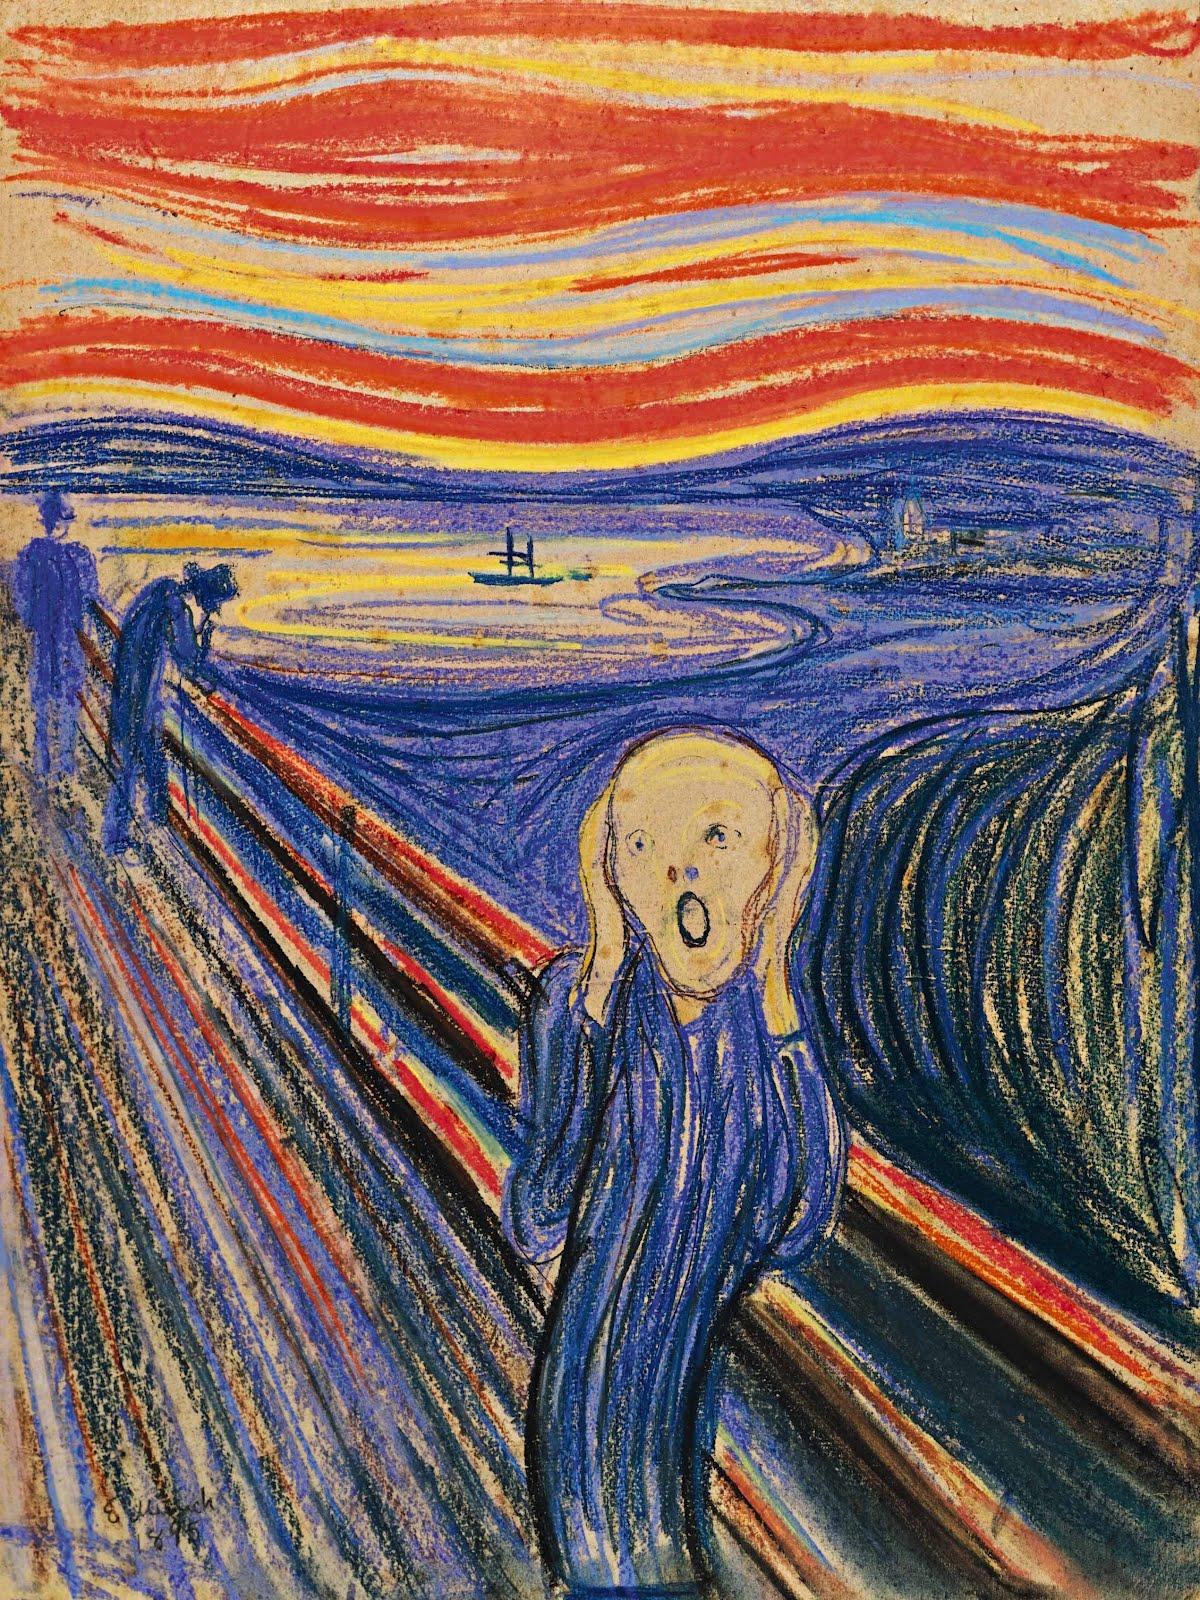 Les 5 Versions De Le Cri D Edvard Munch